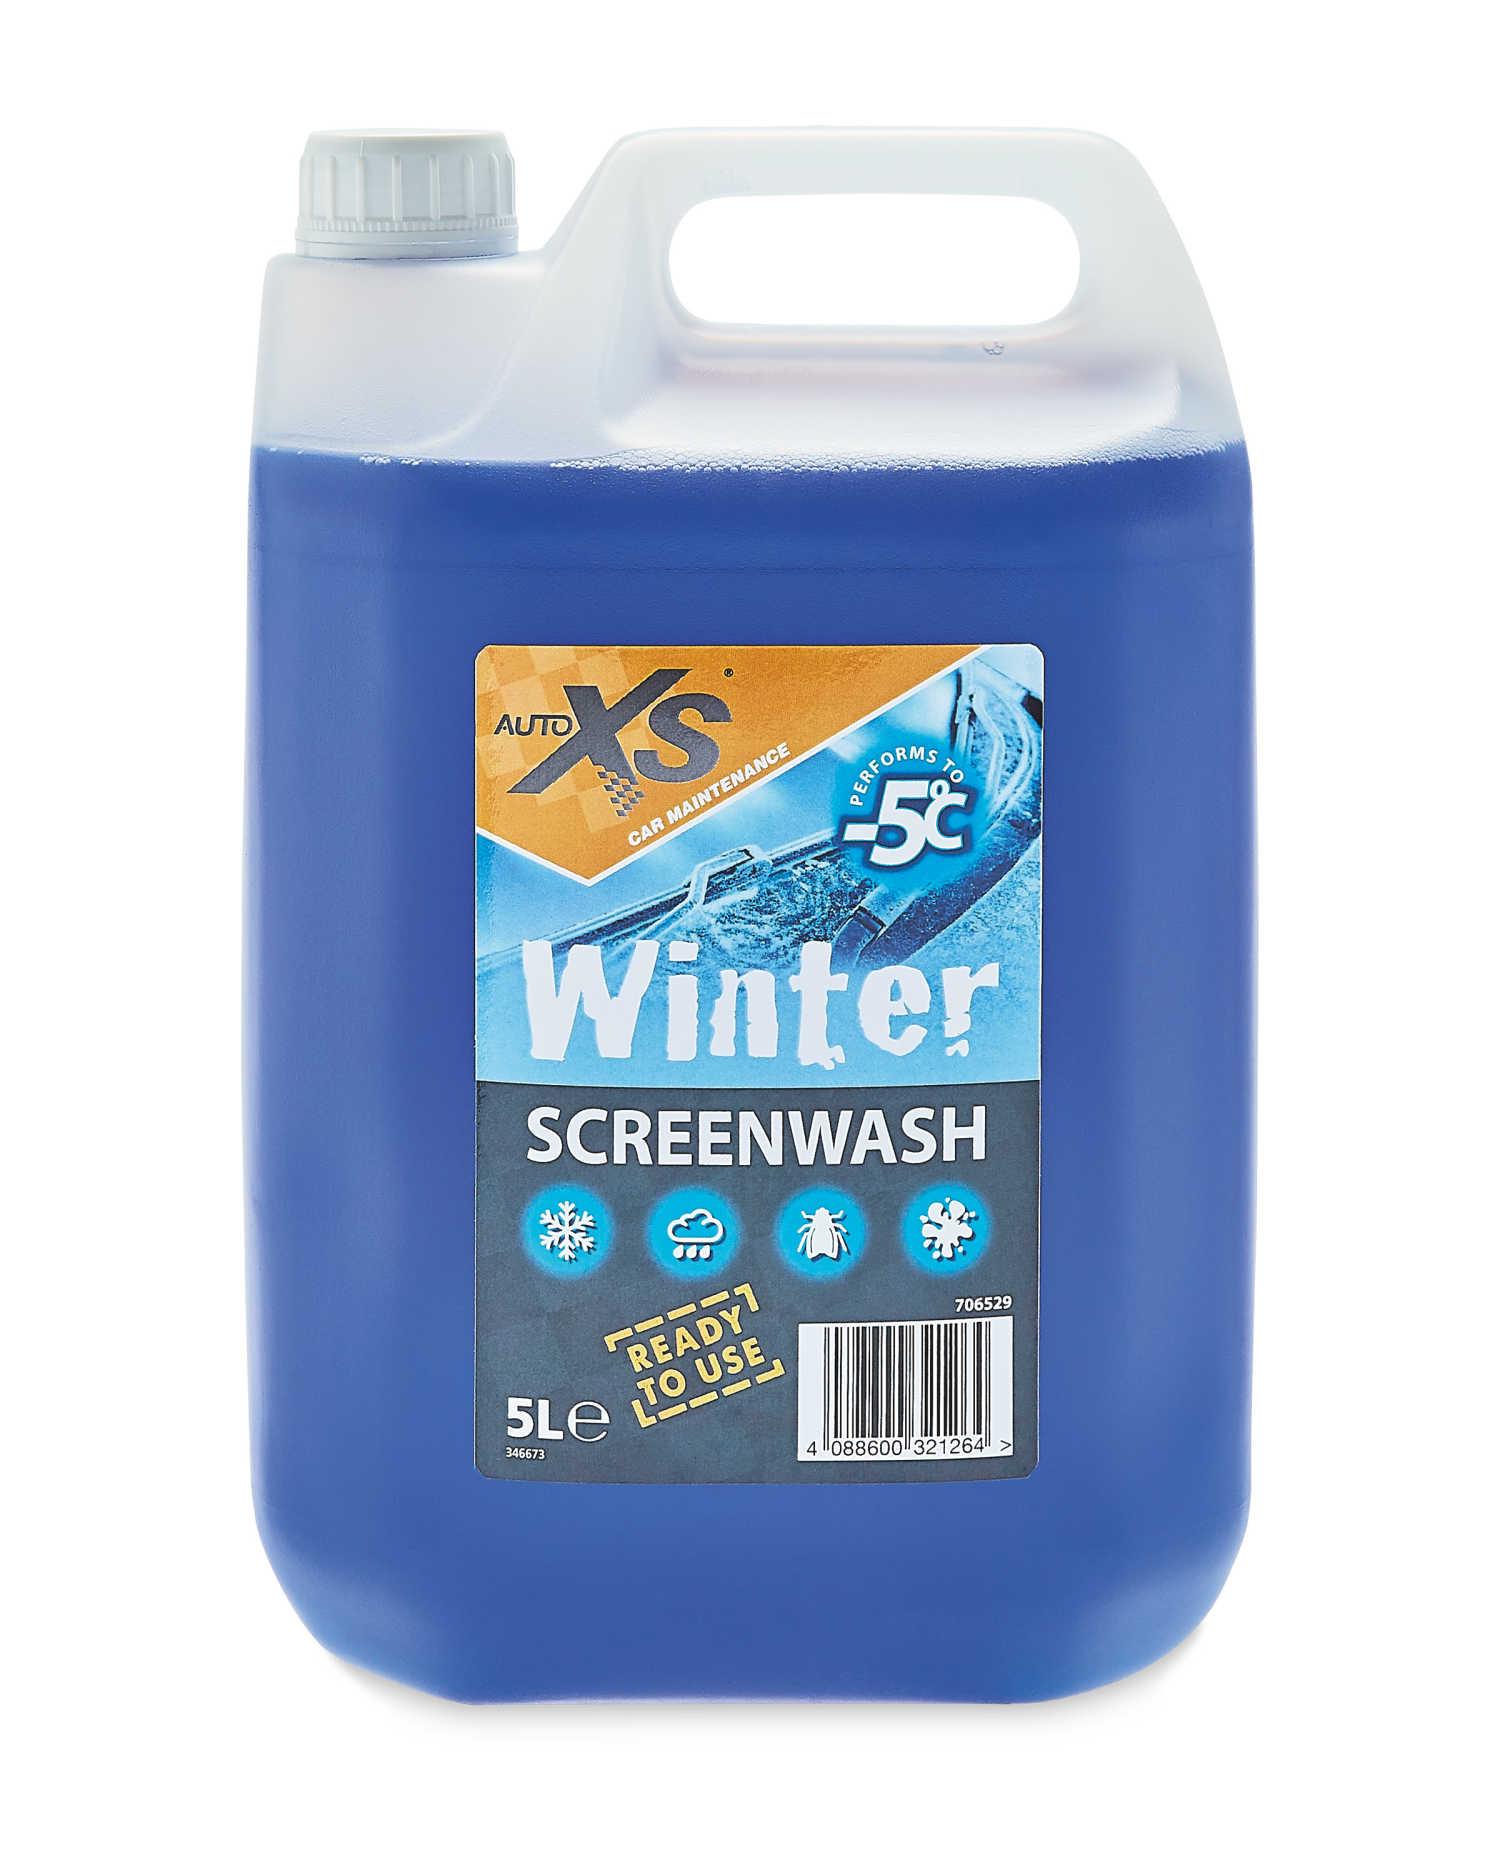 Auto XS Winter Screen Wash - £1.99 instore only @ Aldi, Blackpool